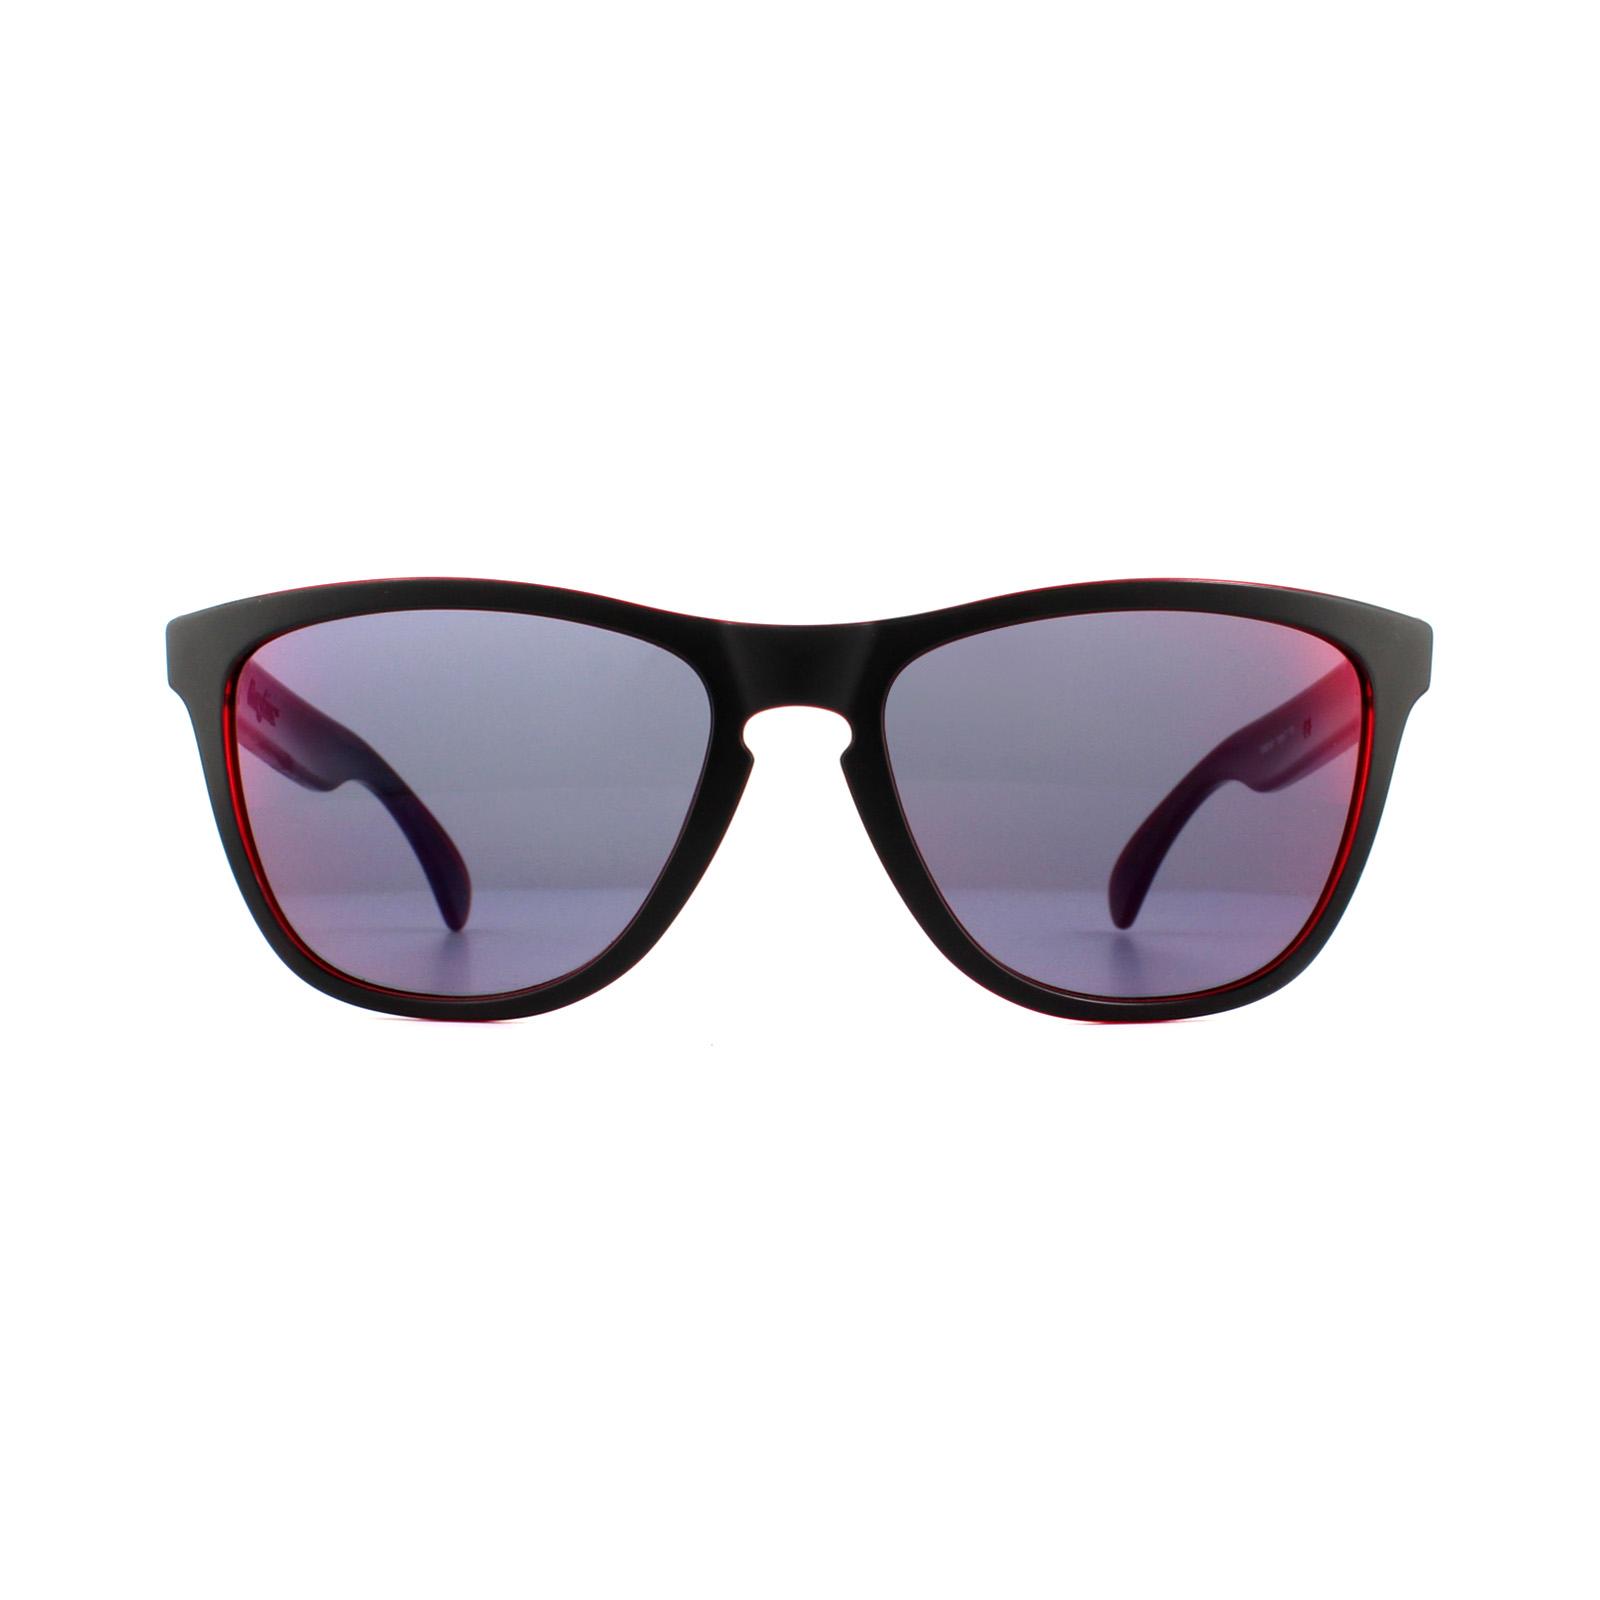 41fcc2e344 Oakley Frogskins Sunglasses Thumbnail 1 Oakley Frogskins Sunglasses  Thumbnail 2 ...